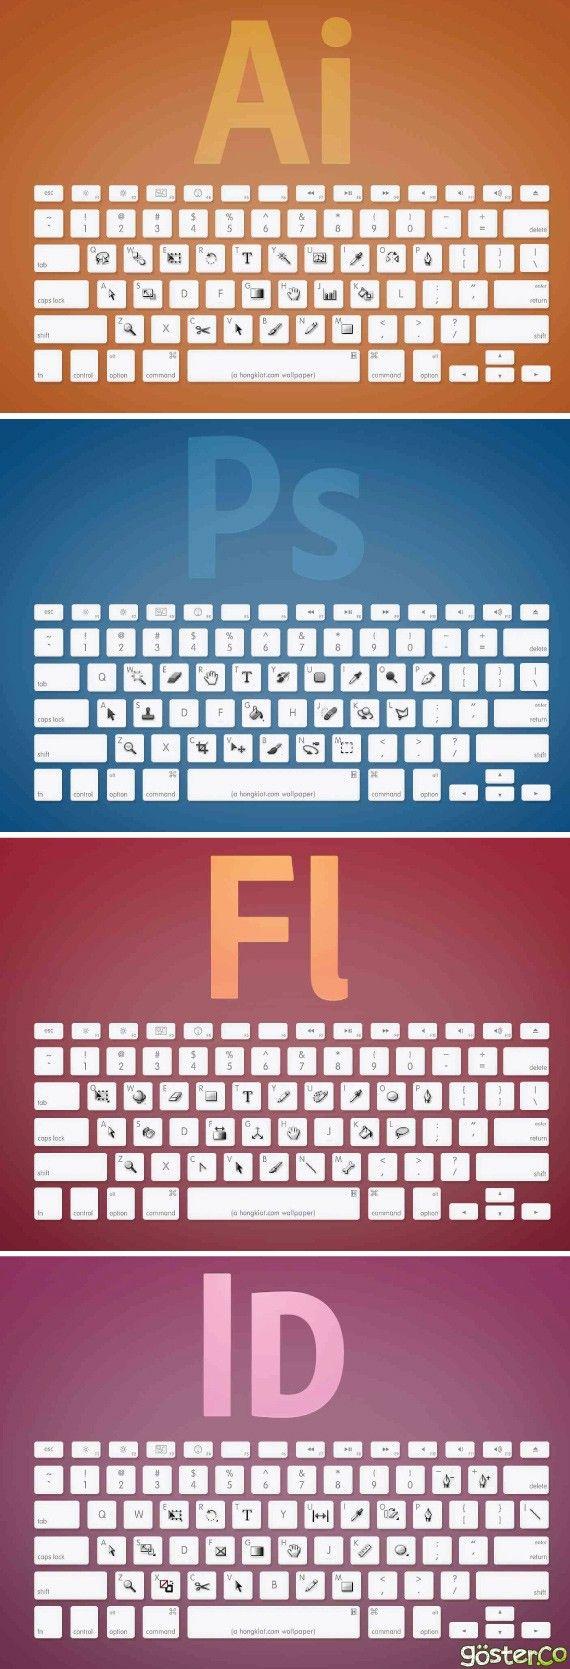 Adobe Keyboard Shortcuts Guide   #photoshop #illustrator #indesign #flash…